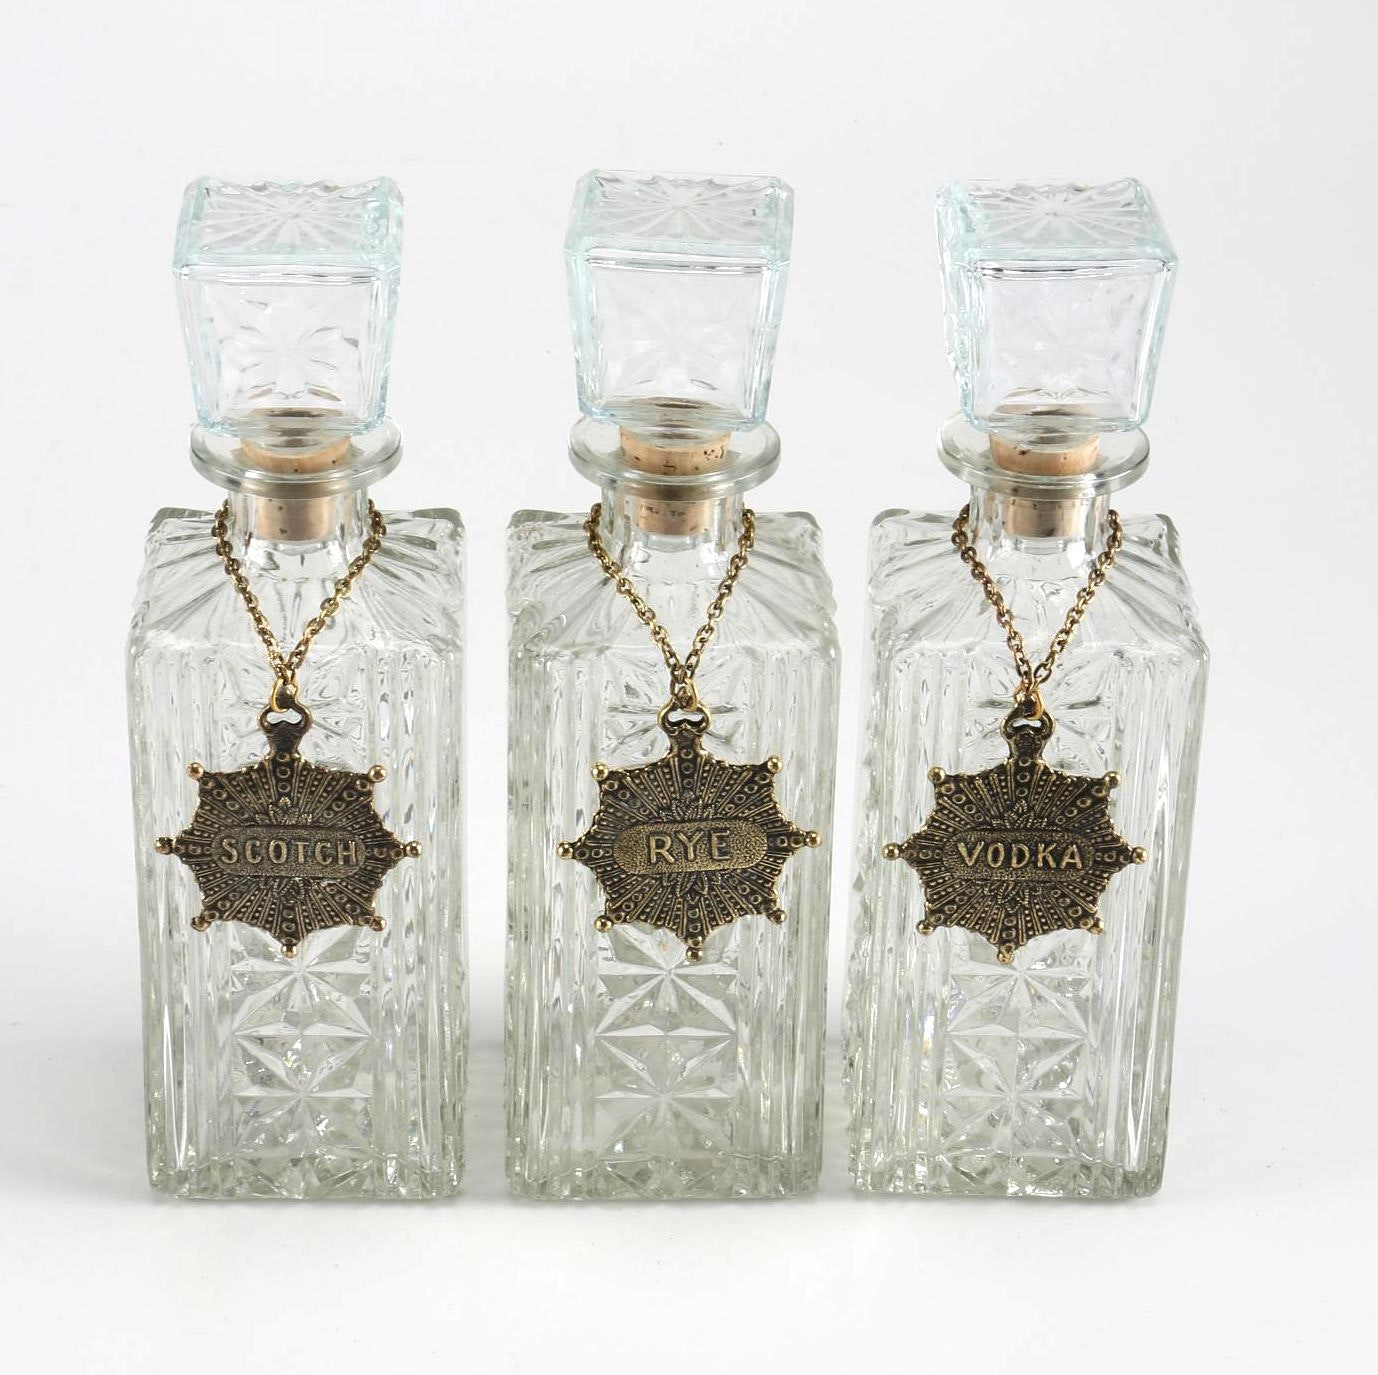 Wheatonware Glass Decanters